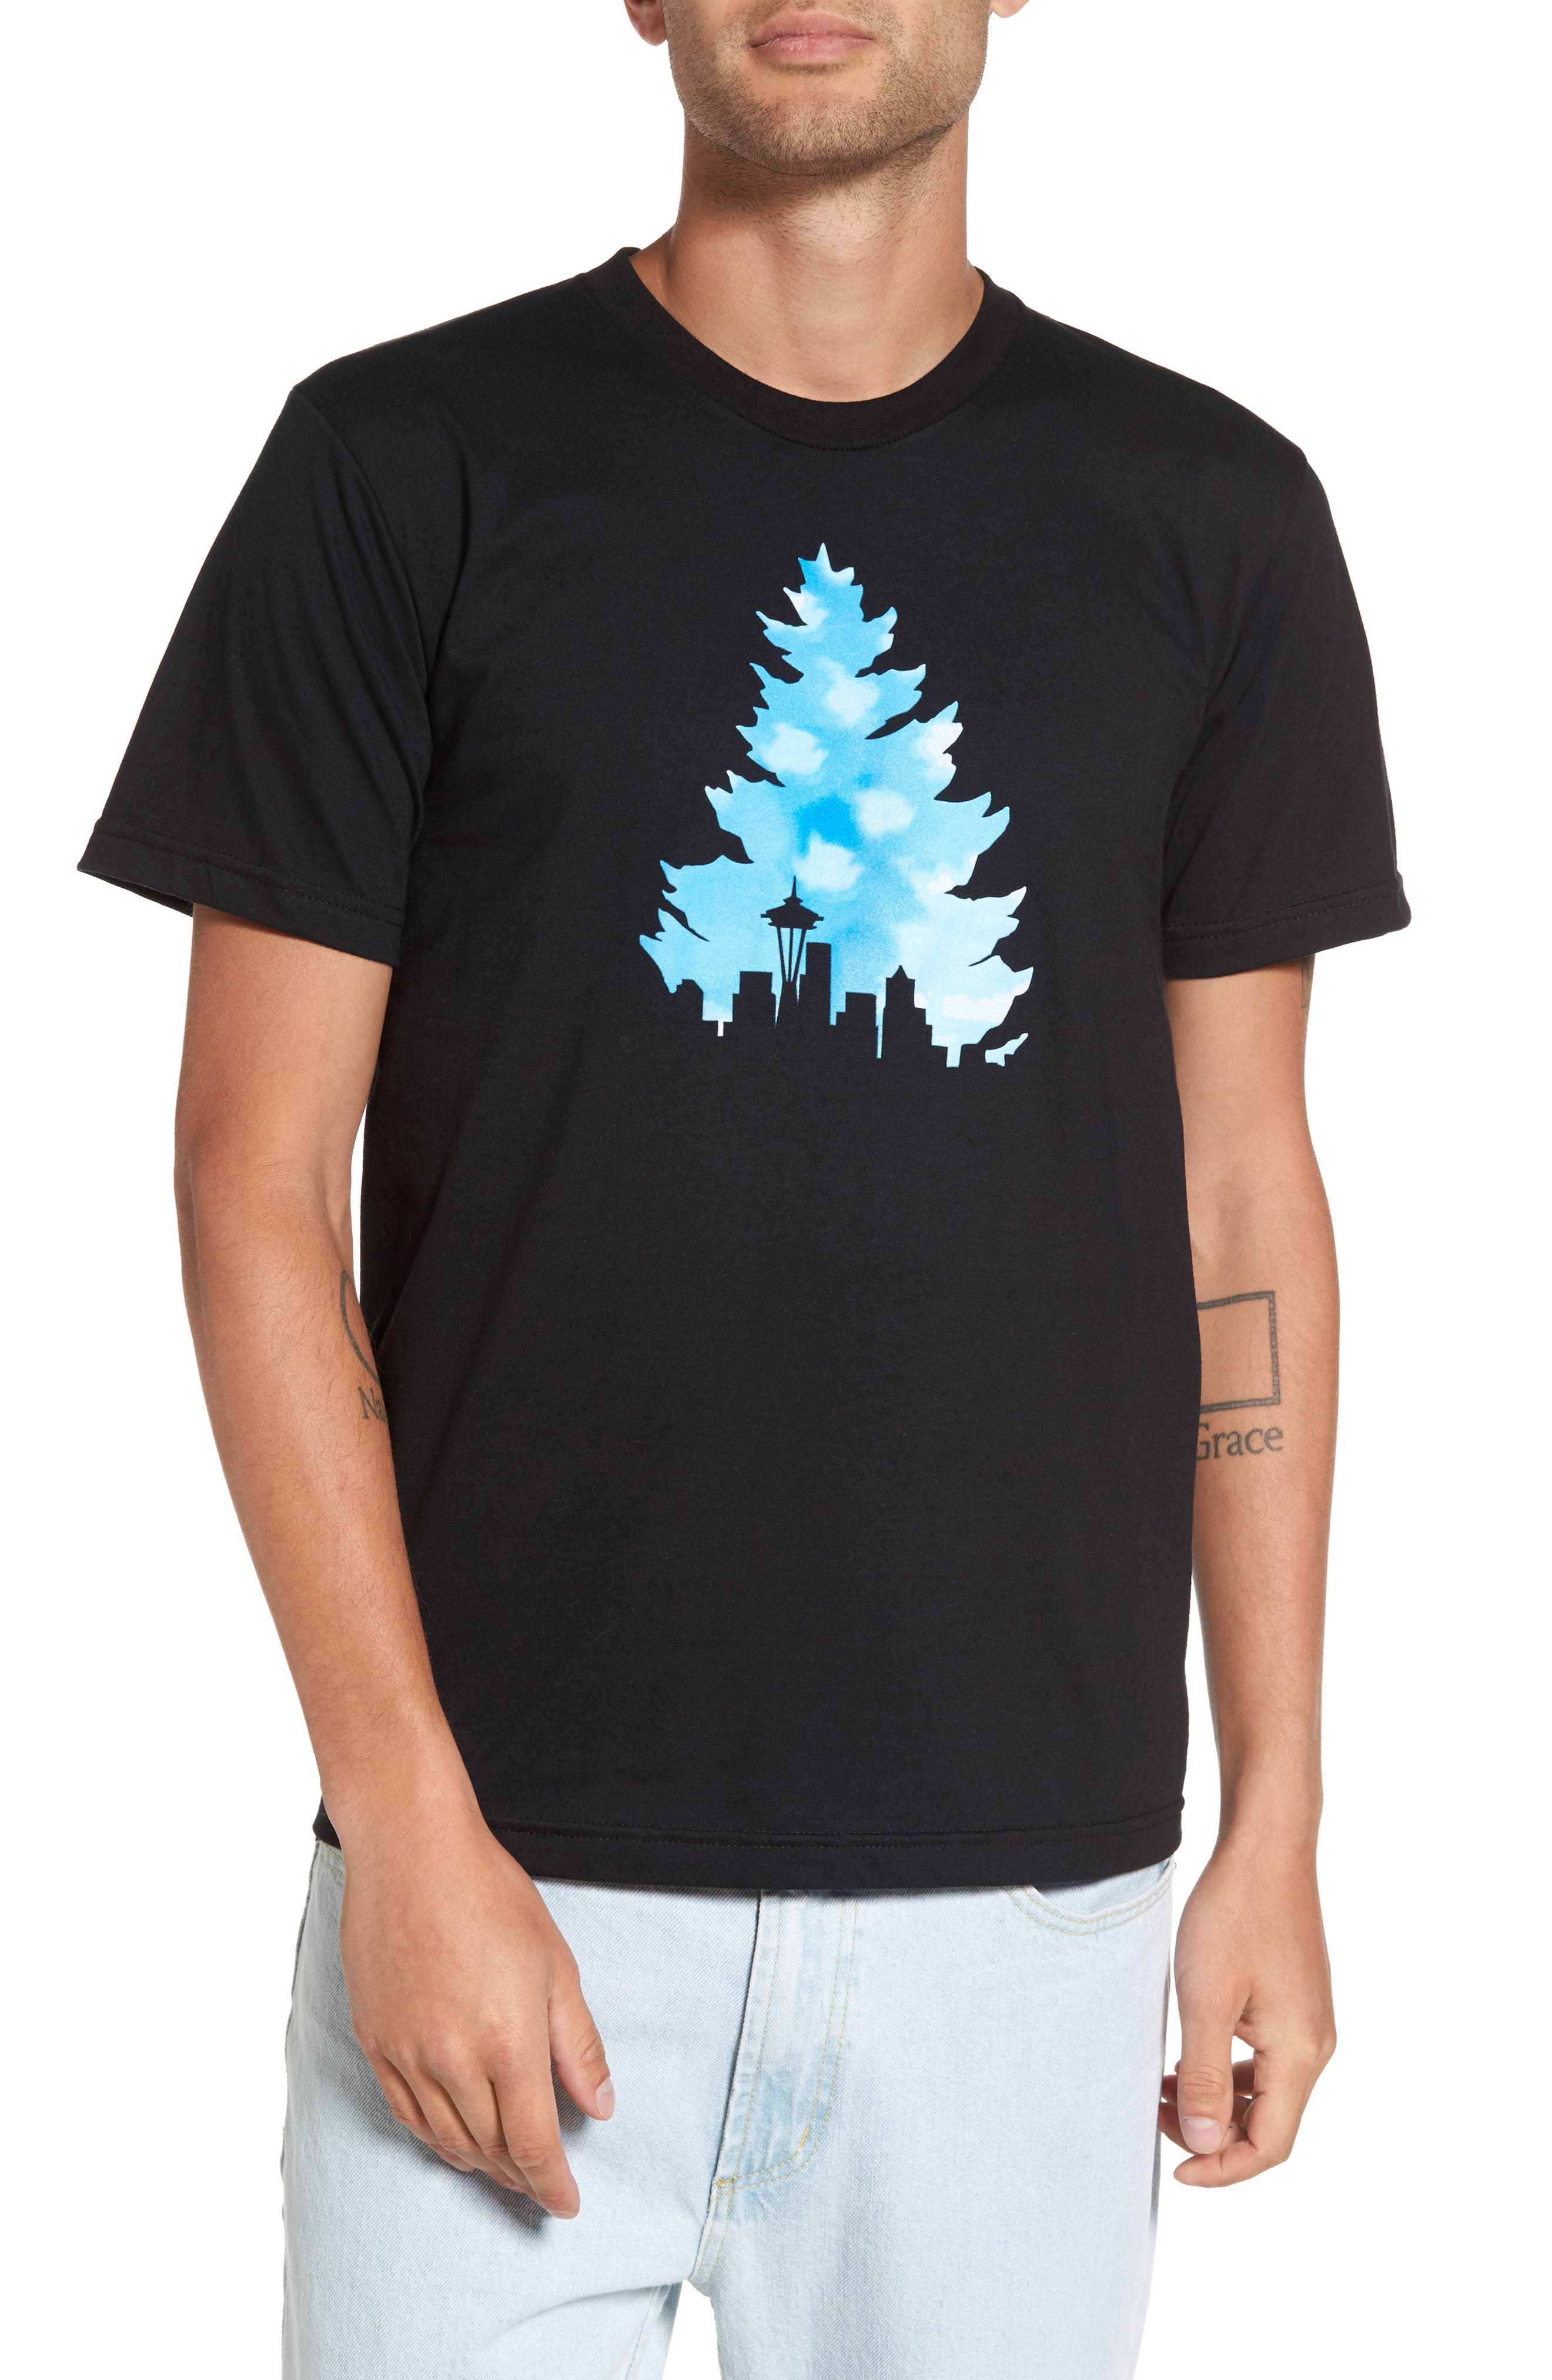 Johnny Tree Clouds T-Shirt,                             Main thumbnail 1, color,                             001